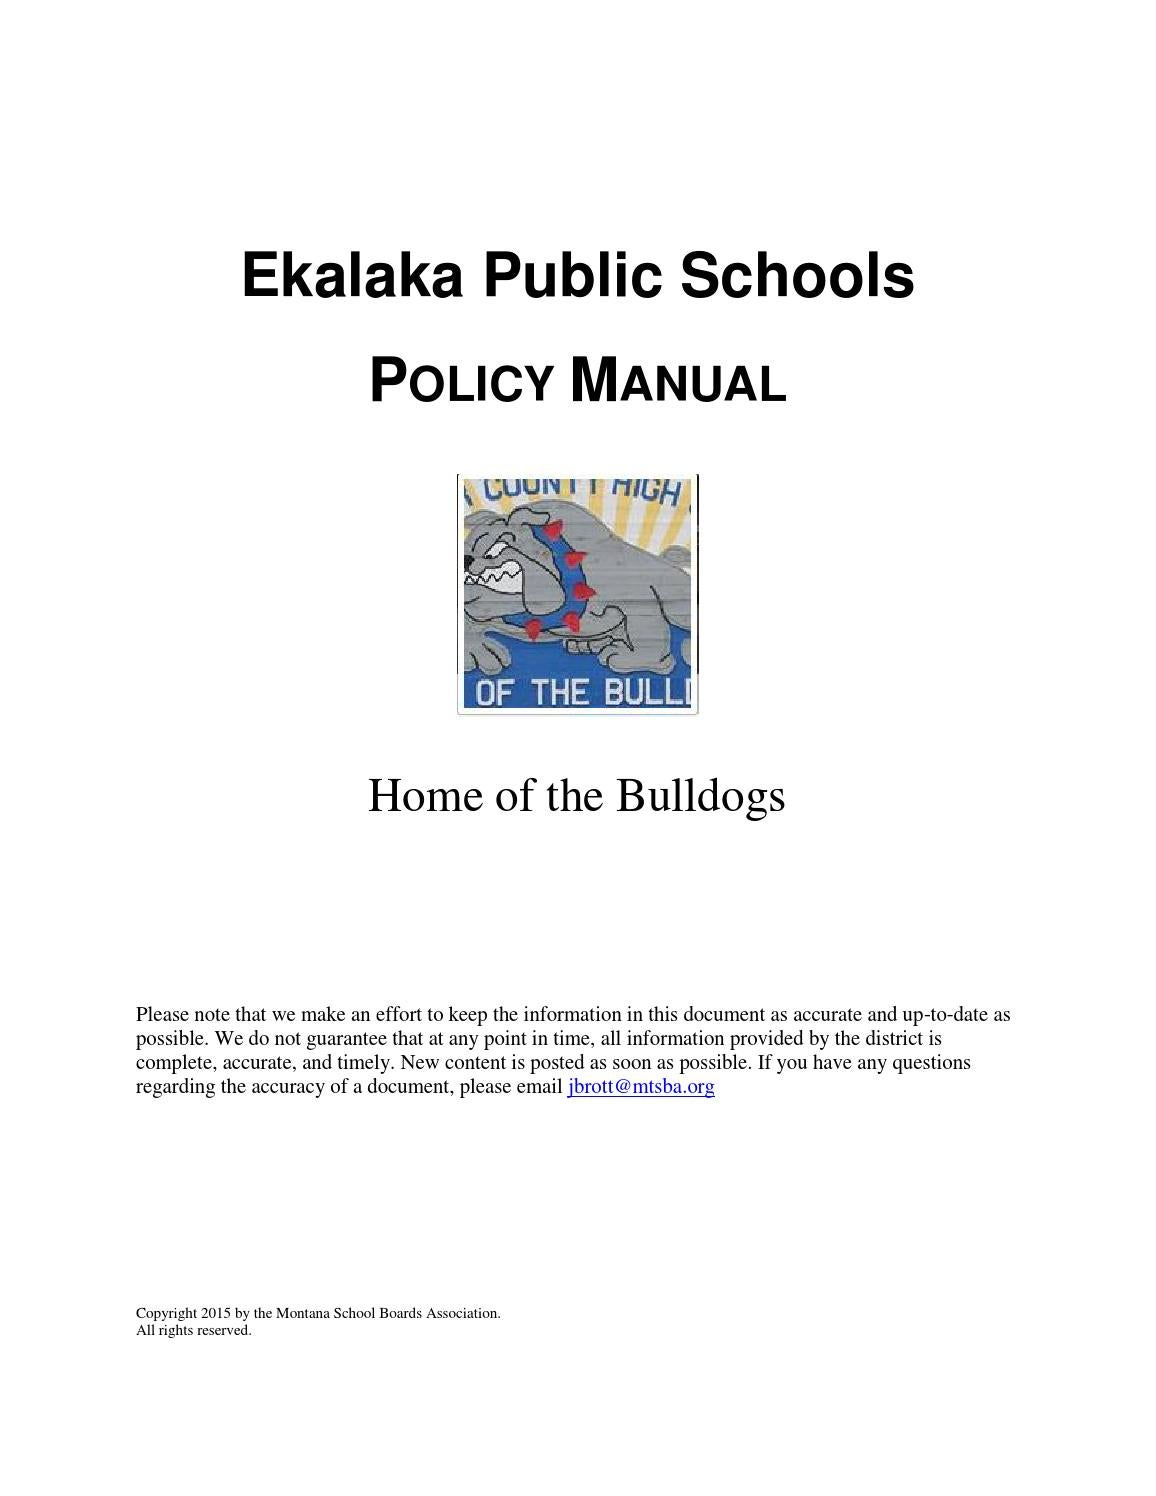 Ekalaka Public Schools Policy Manual by Montana School Boards Association -  issuu